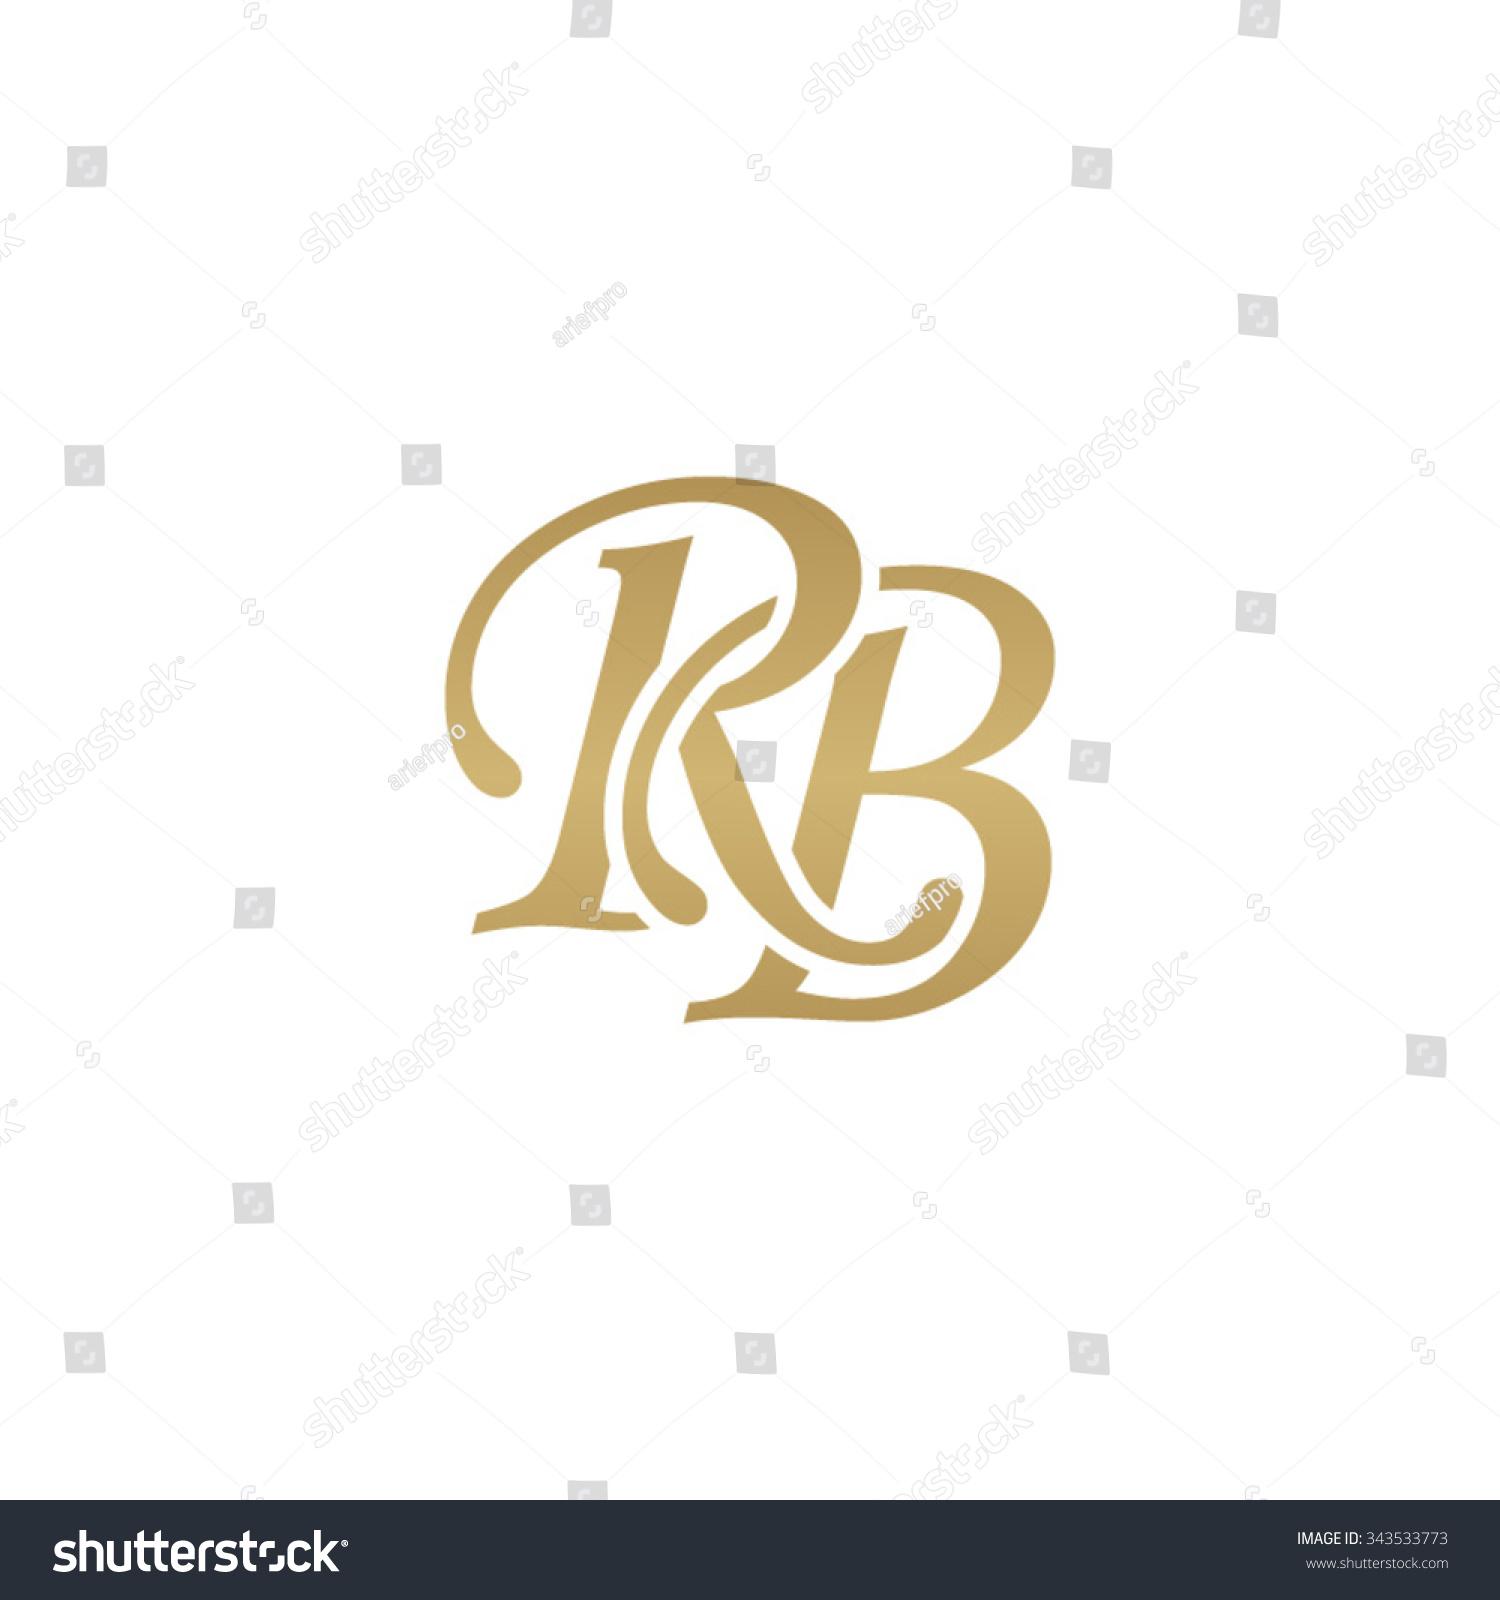 Rb heritage malta rb buycottarizona Choice Image